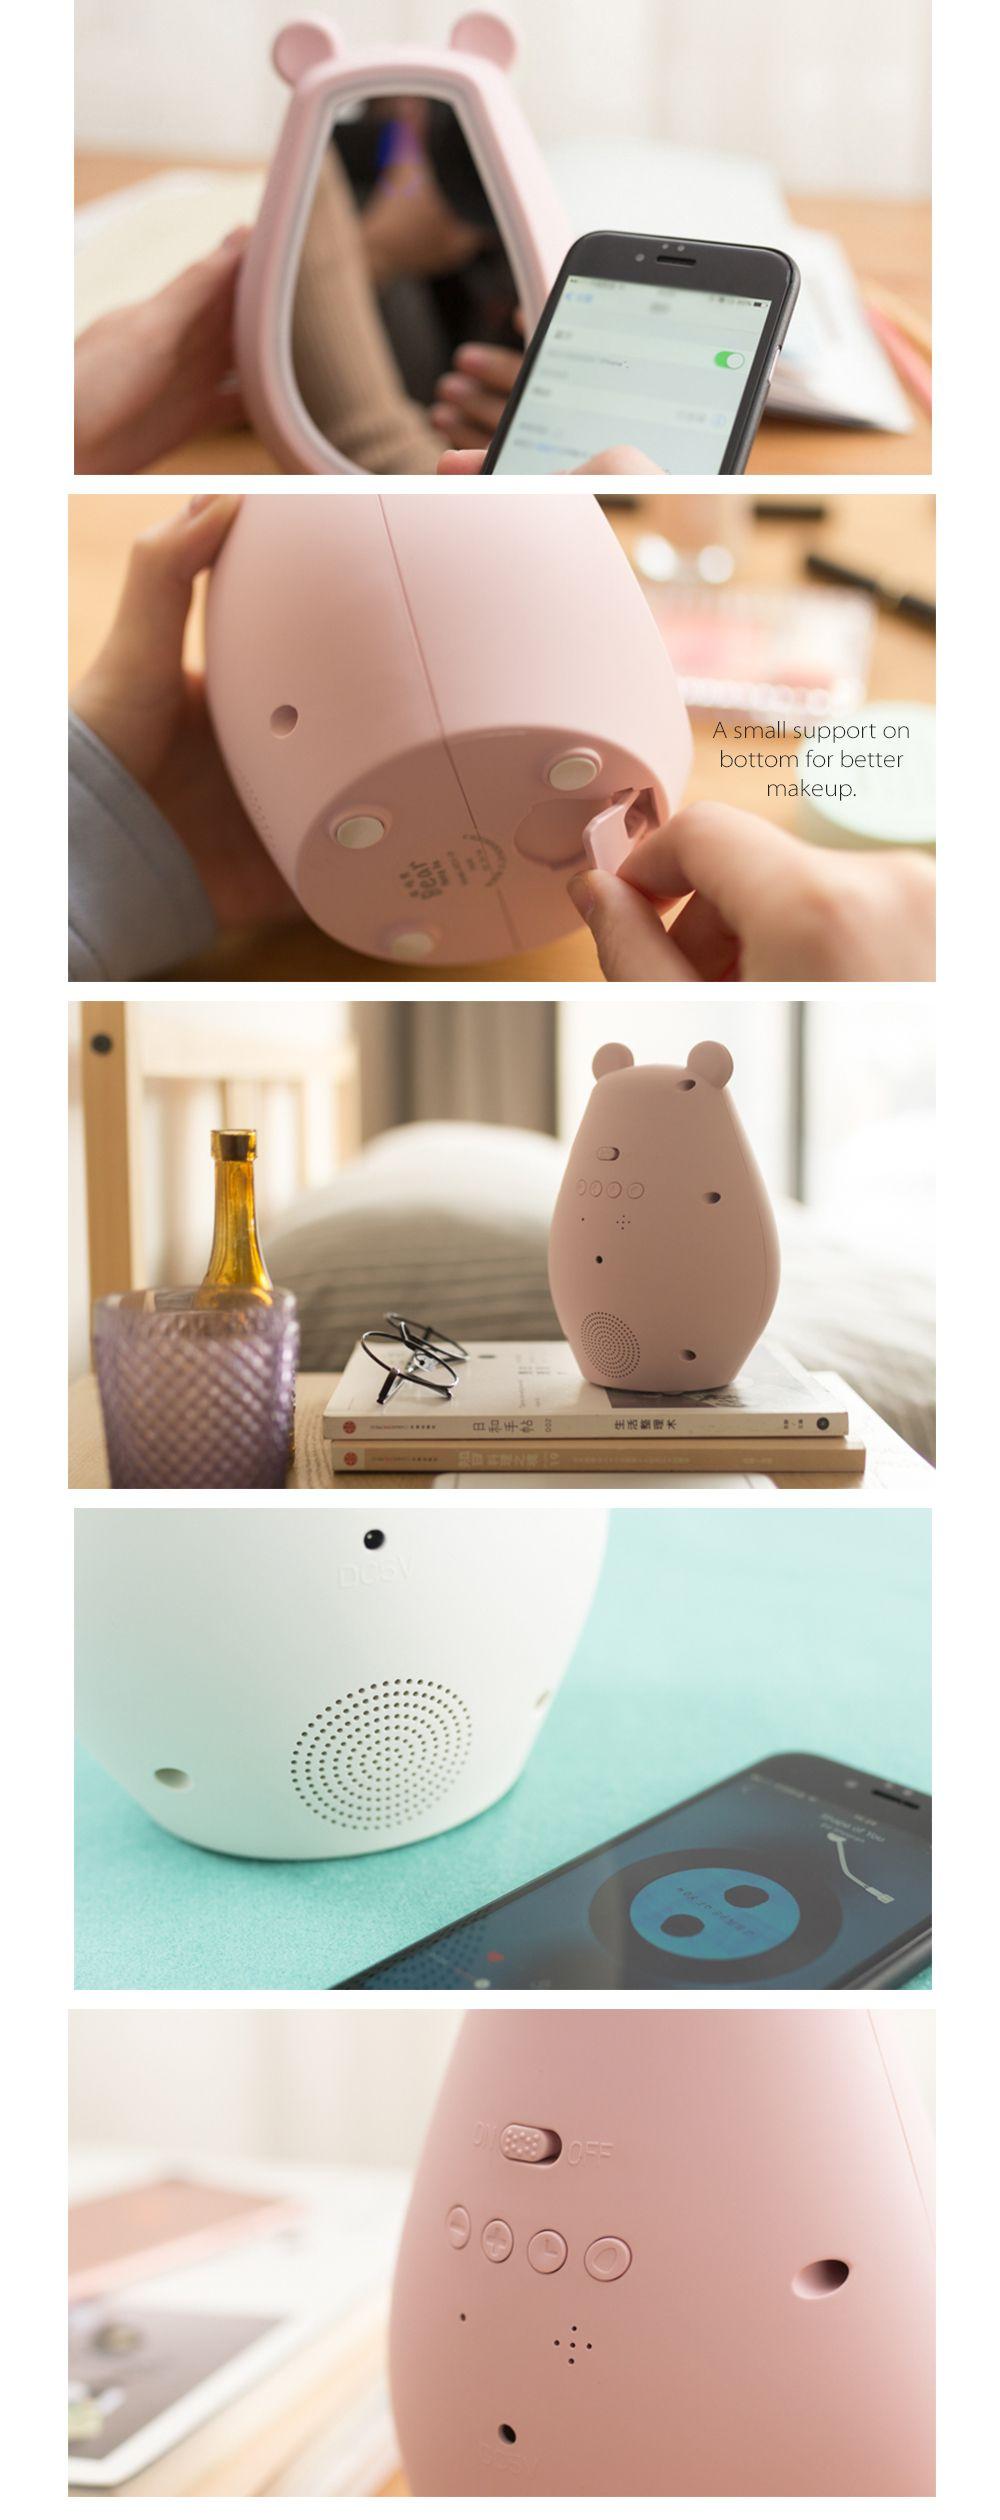 Wireless Makeup Mirror Alarm Clock Multifunctional Design